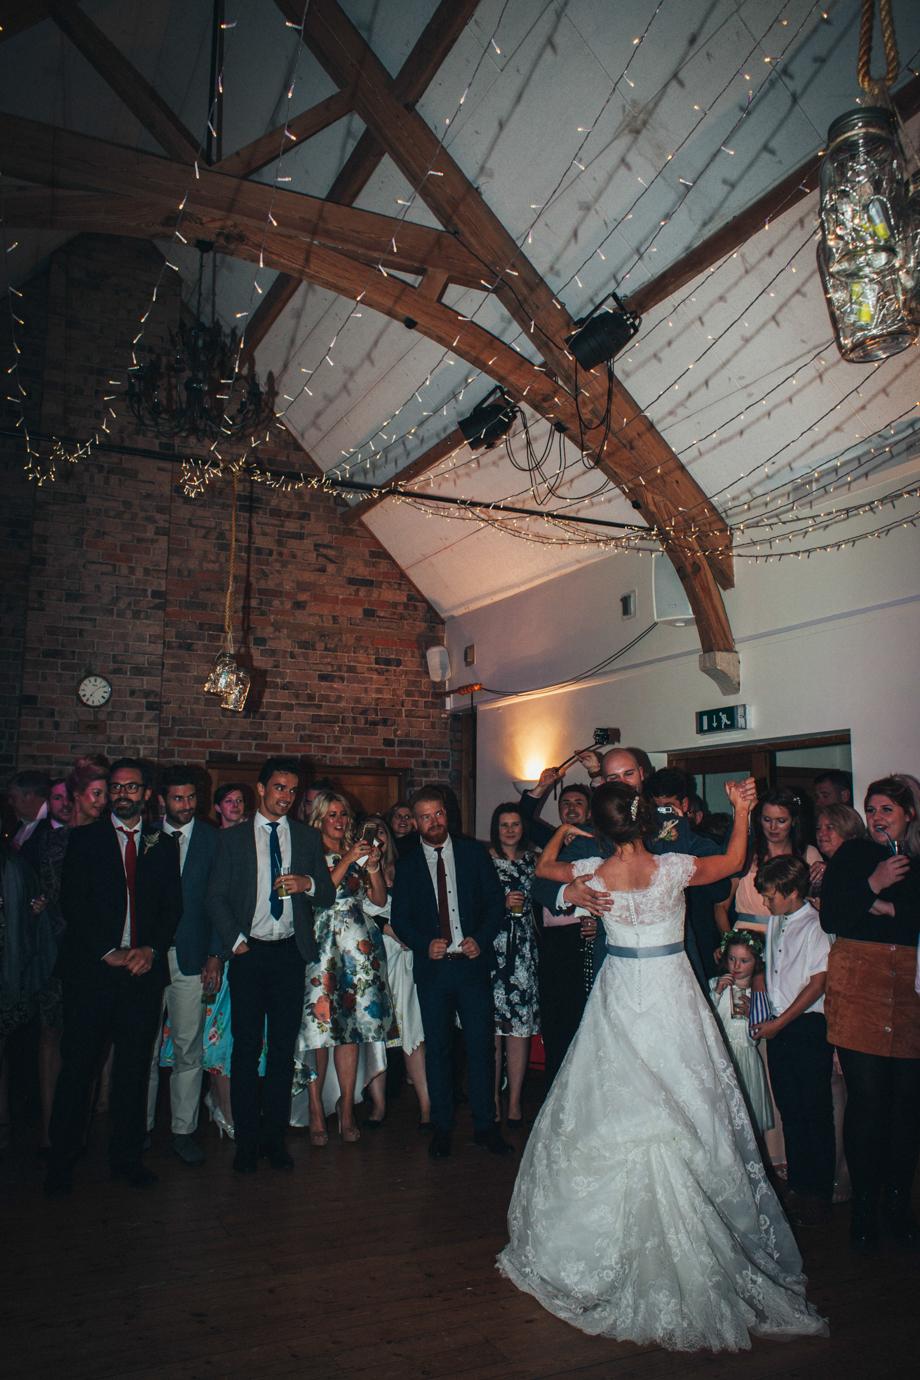 Shropshire-Festival-Wedding-74